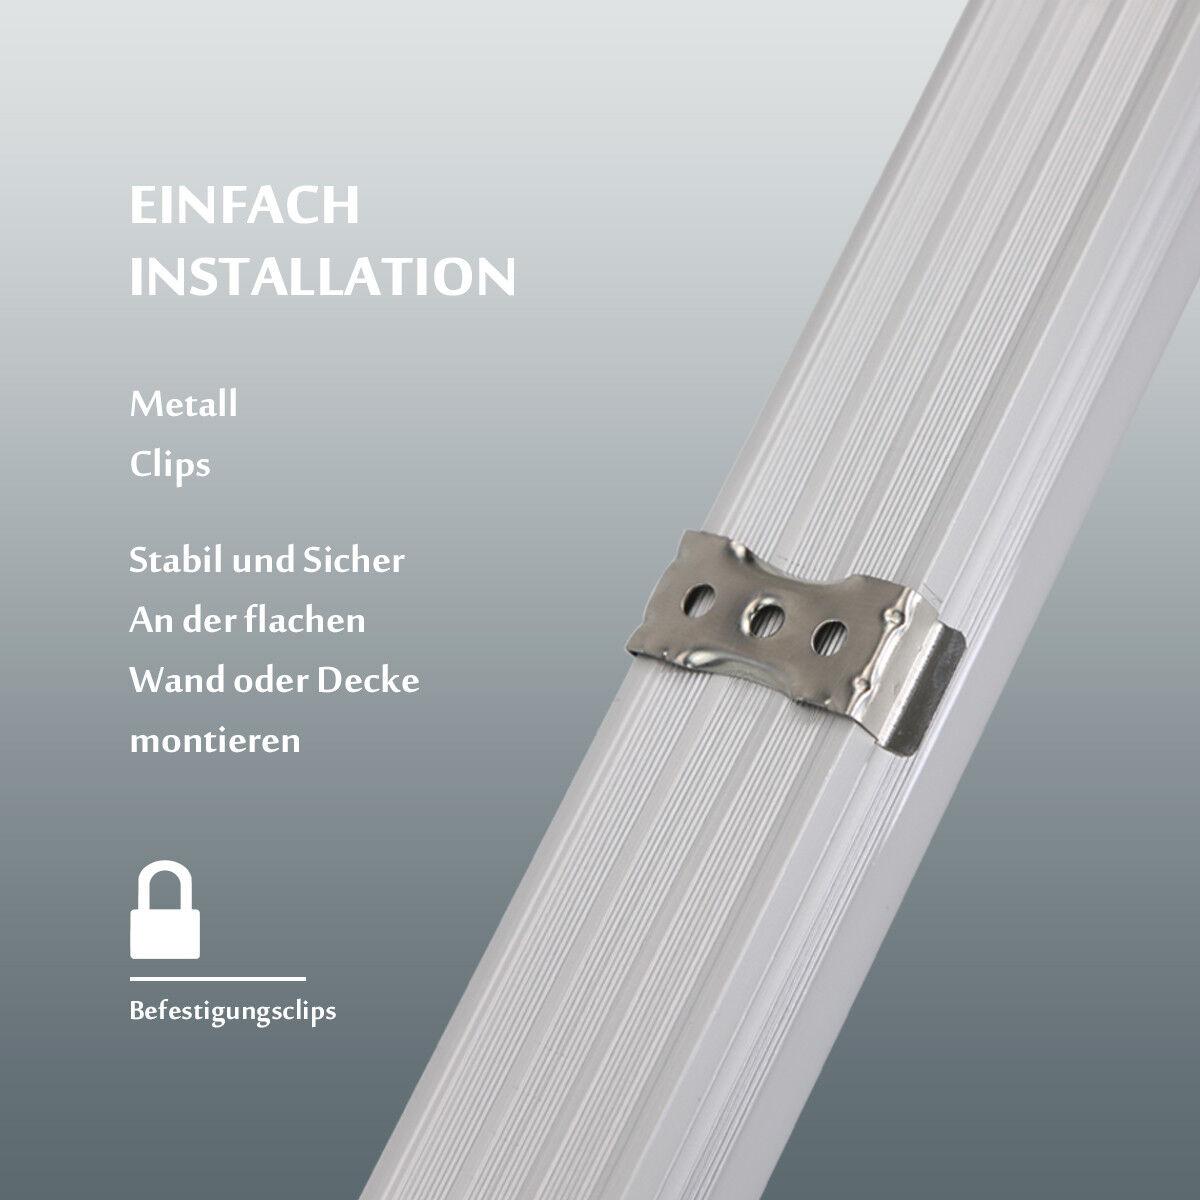 LED Leuchtstoffröhre 120cm 150cm komplett Set mit Fassung T8 Röhre ...